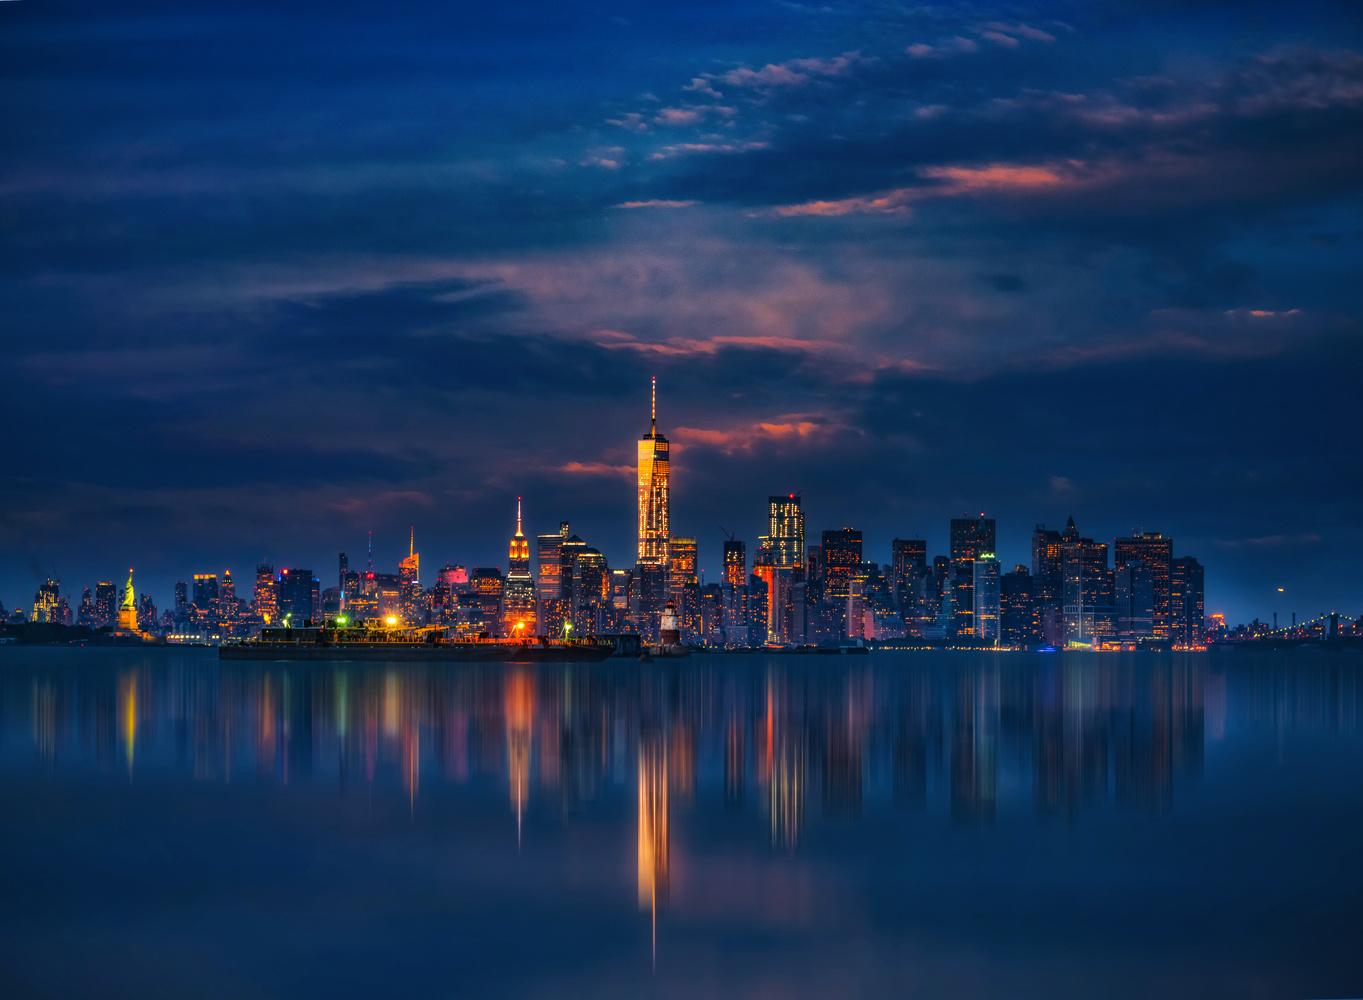 NYC Night by Alex Hill